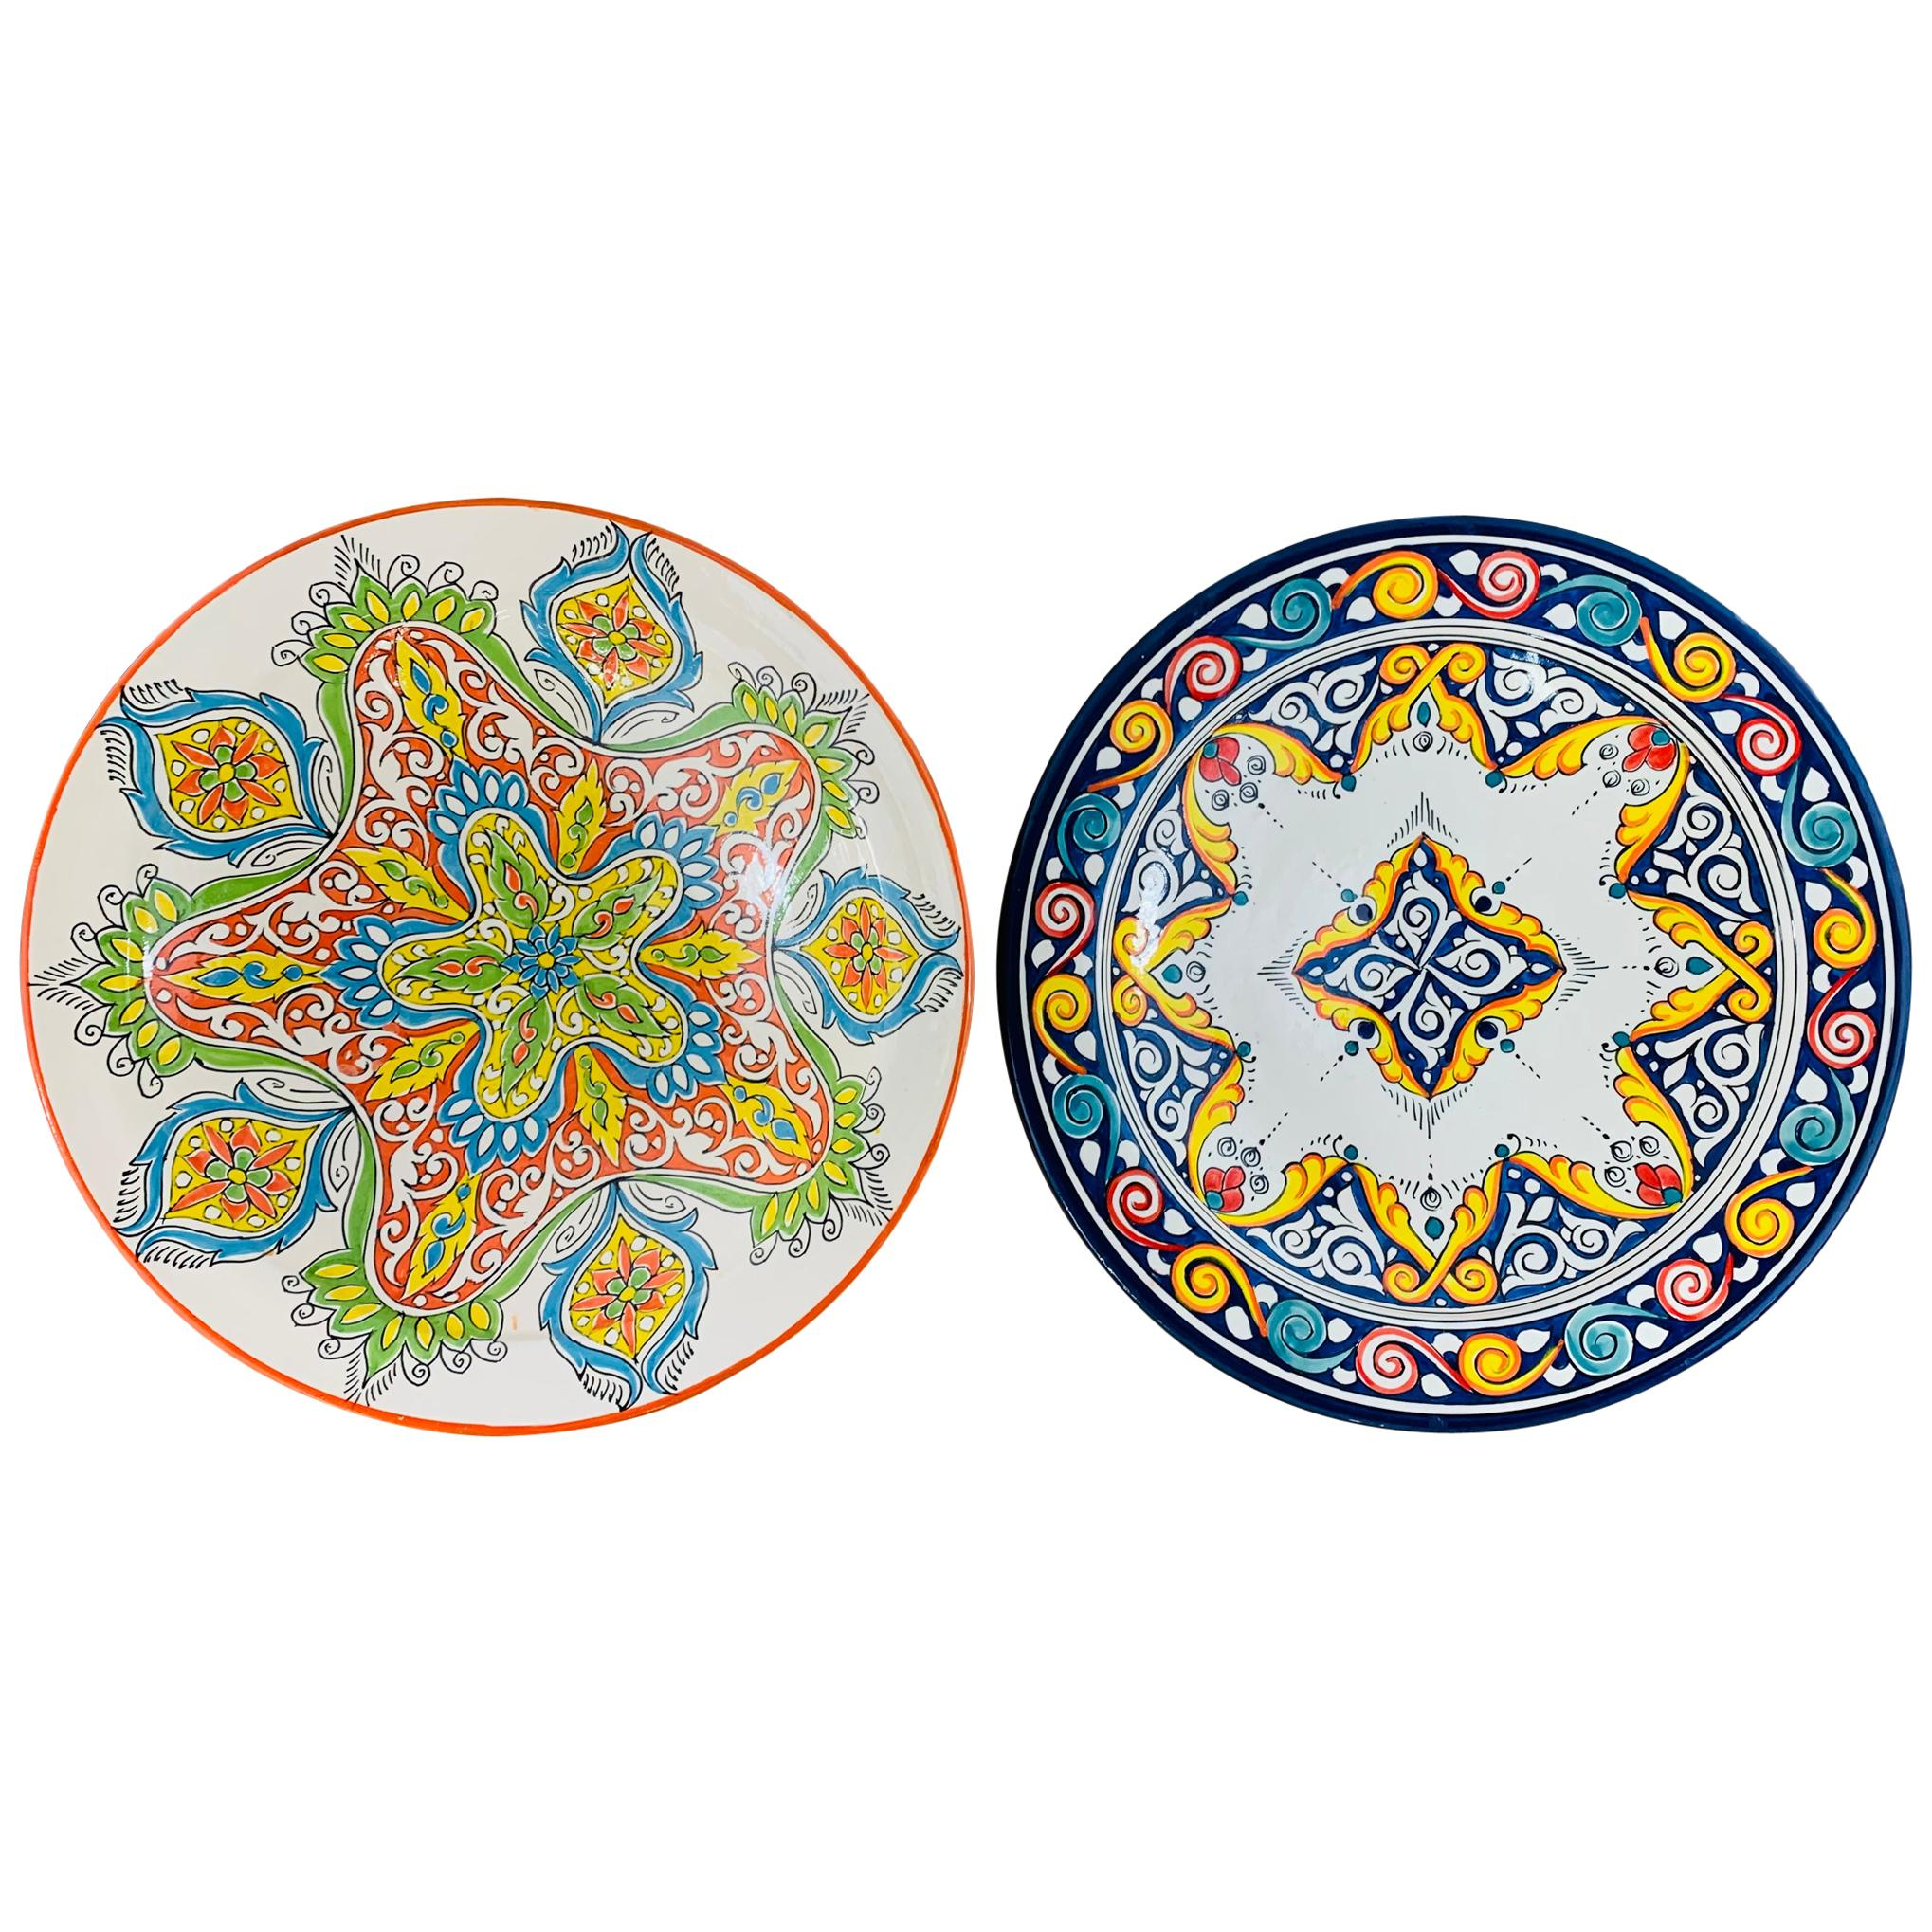 Handmade Large Ceramic Serving, Decorative or Center Table Plate, Set of 2